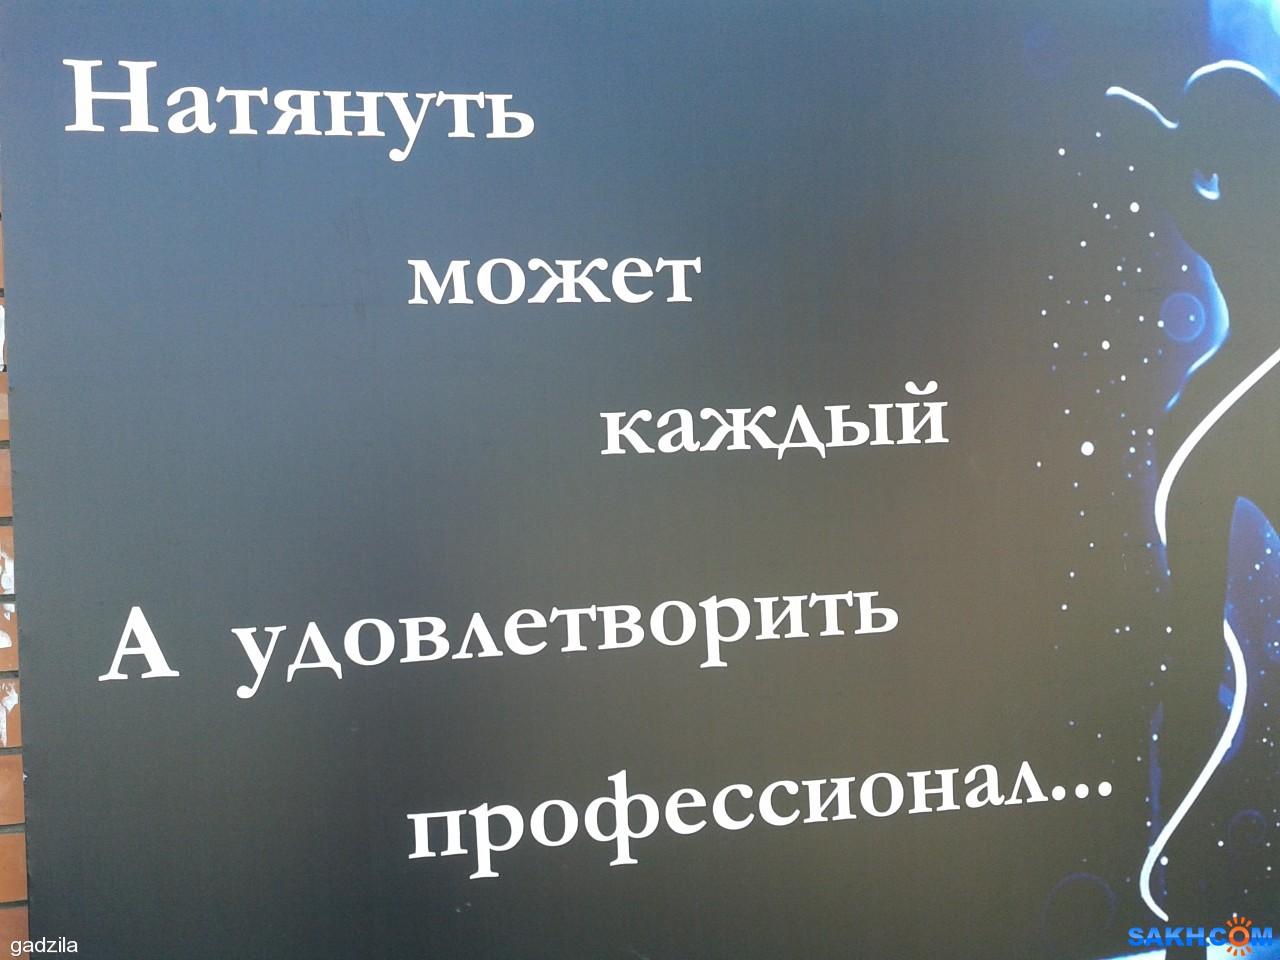 gadzila: Реклама натяжных потолков на Кубани